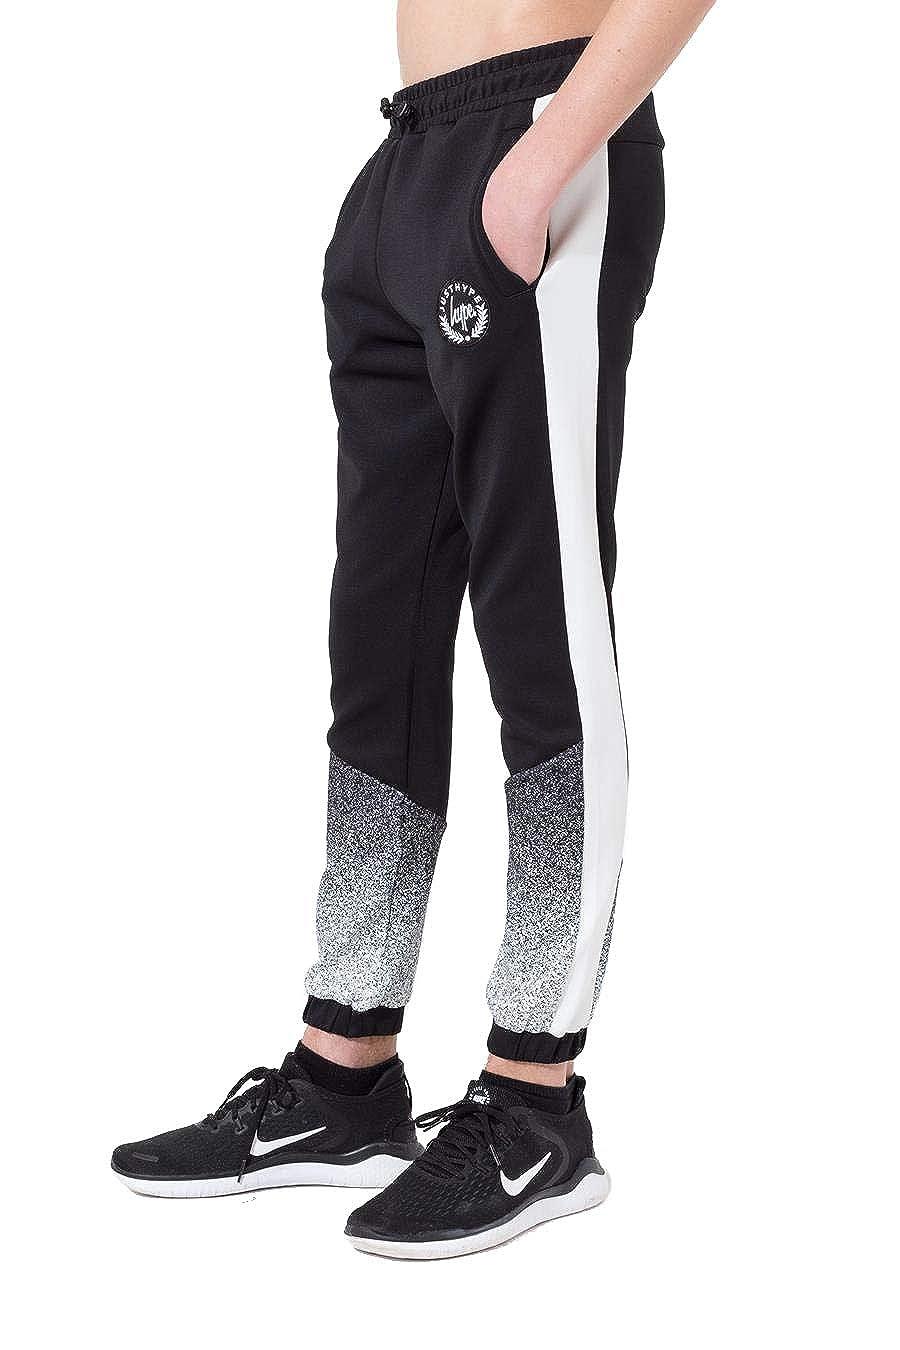 Hype Black Speckle Fade Crest Kids Track Pants